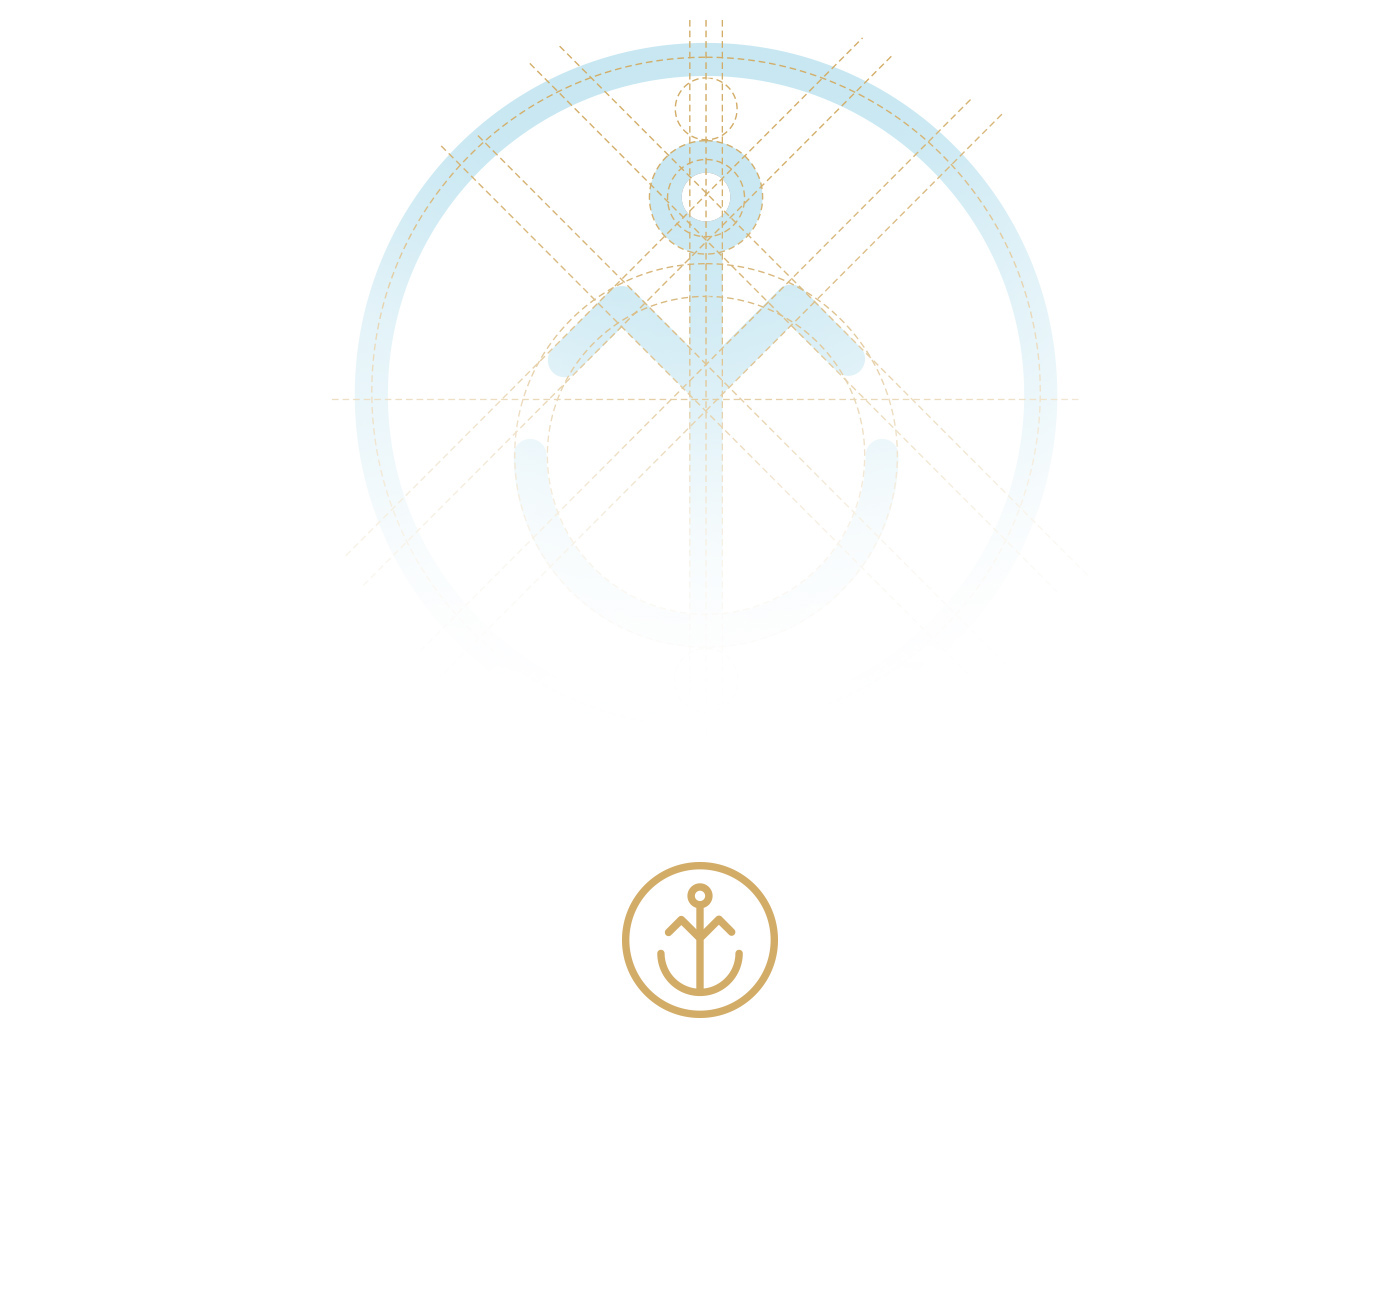 logo Logotype brand smile Emoticon anchor symbol flag identity social Government consultant thales duarte